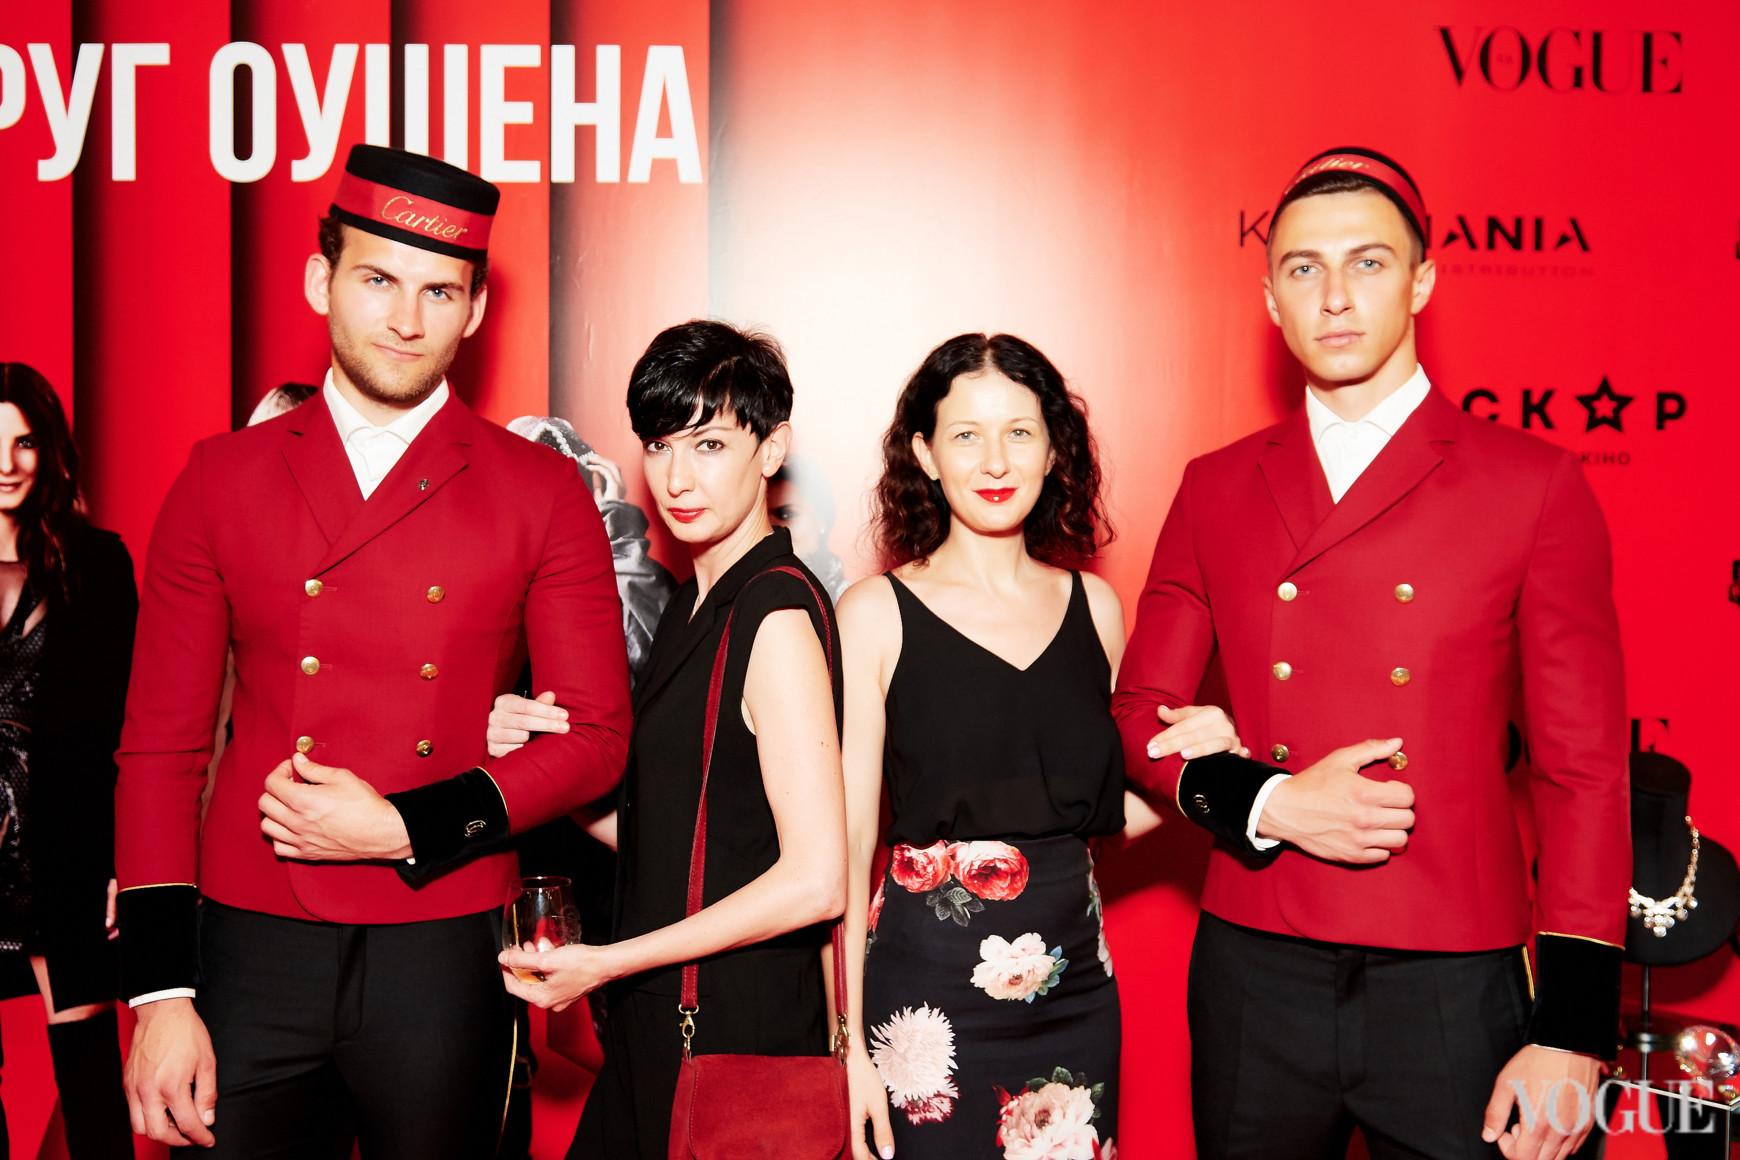 Виолетта Скодорова и Светлана Рощук